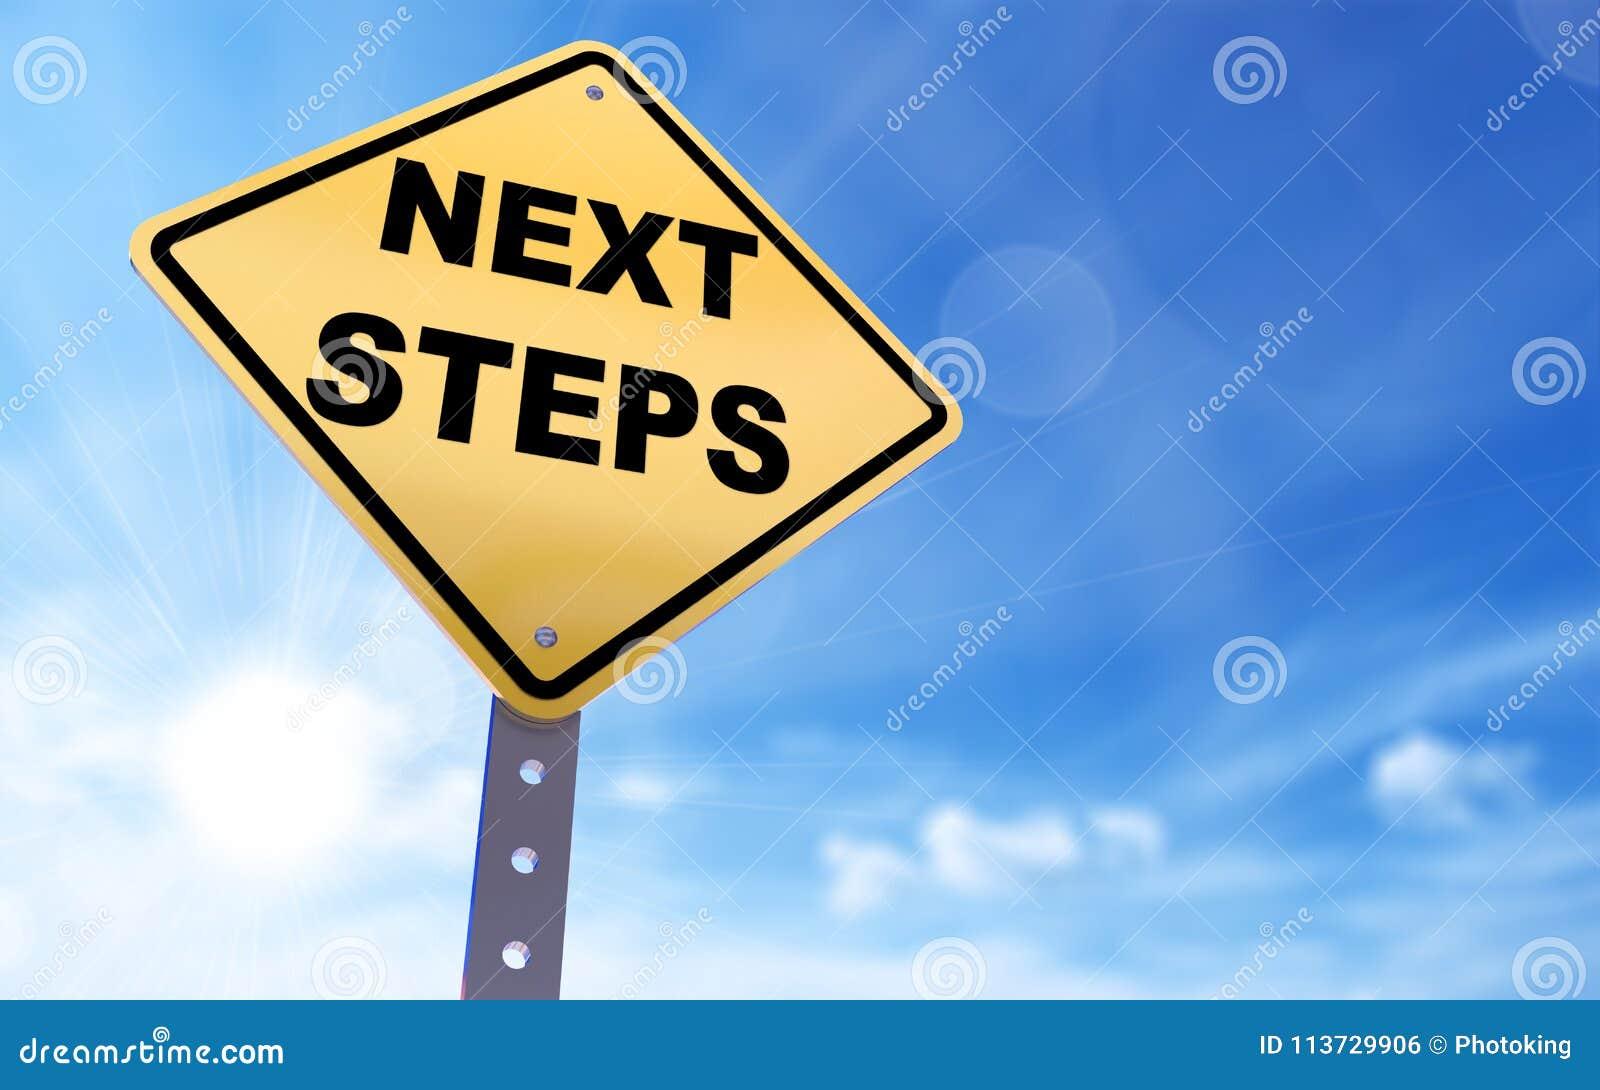 Next steps sign